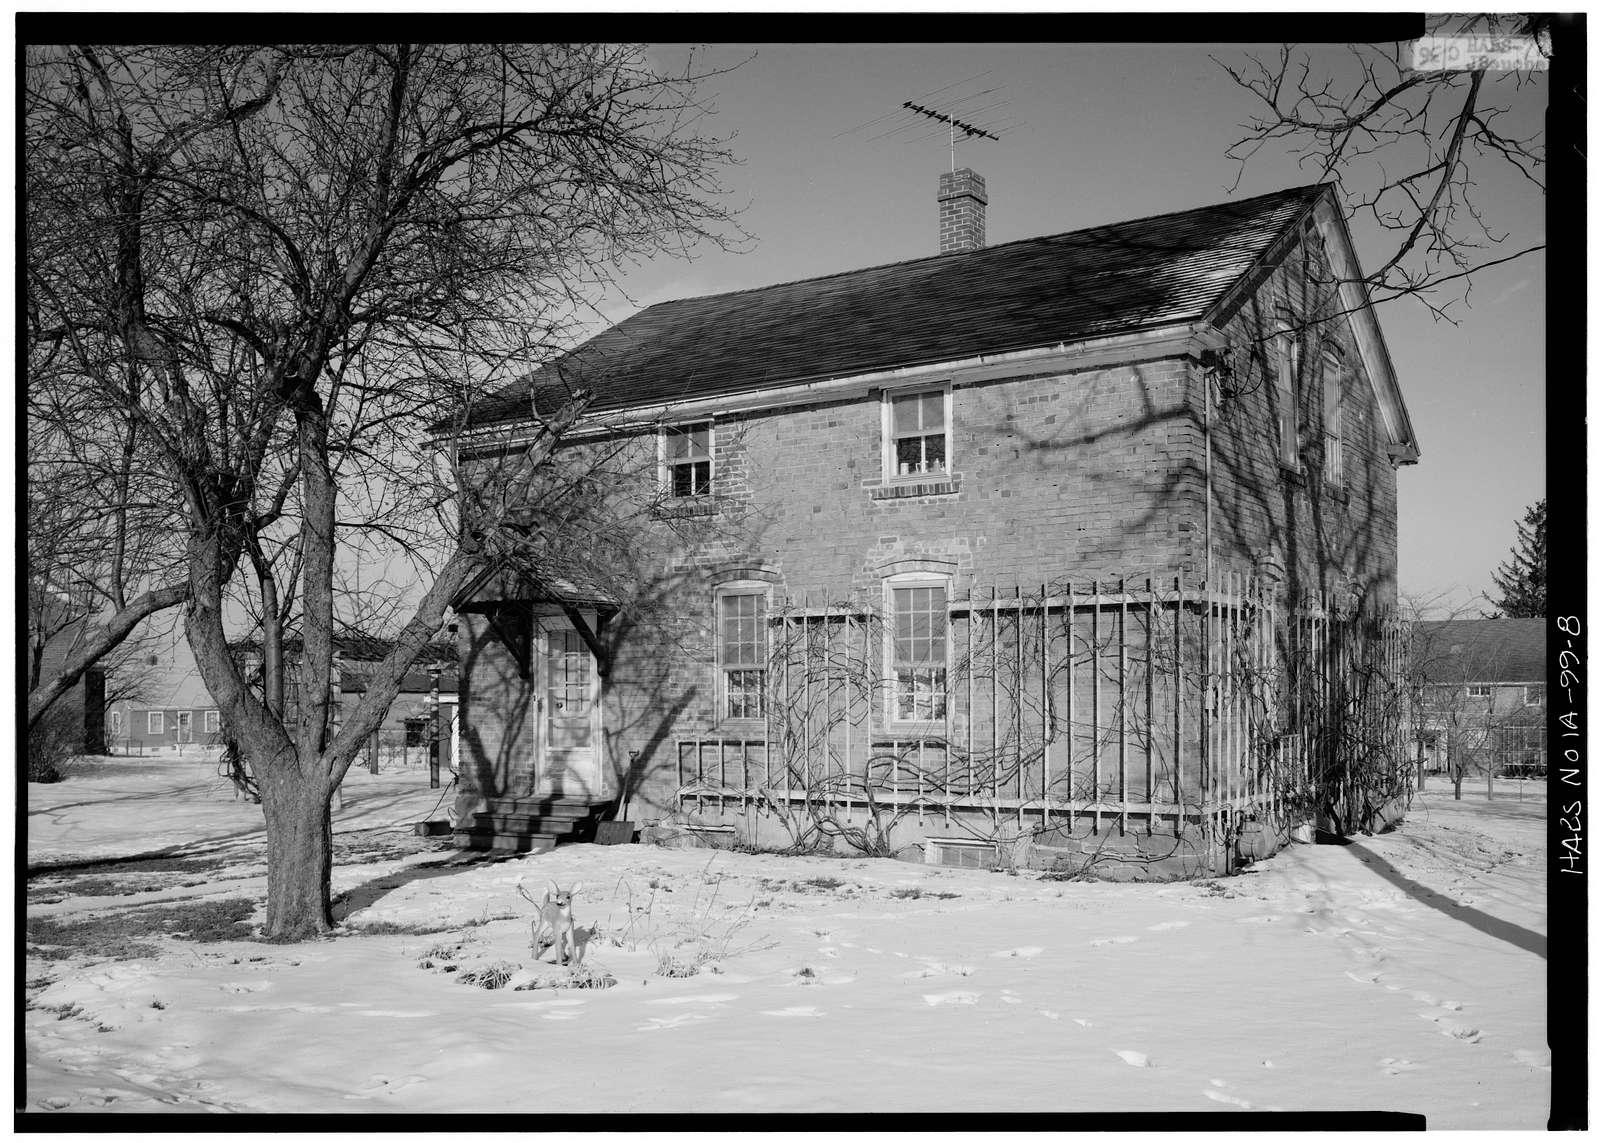 Amana Colonies, State Routes 223 & 149 & U.S. Route 6, Amana, Iowa County, IA